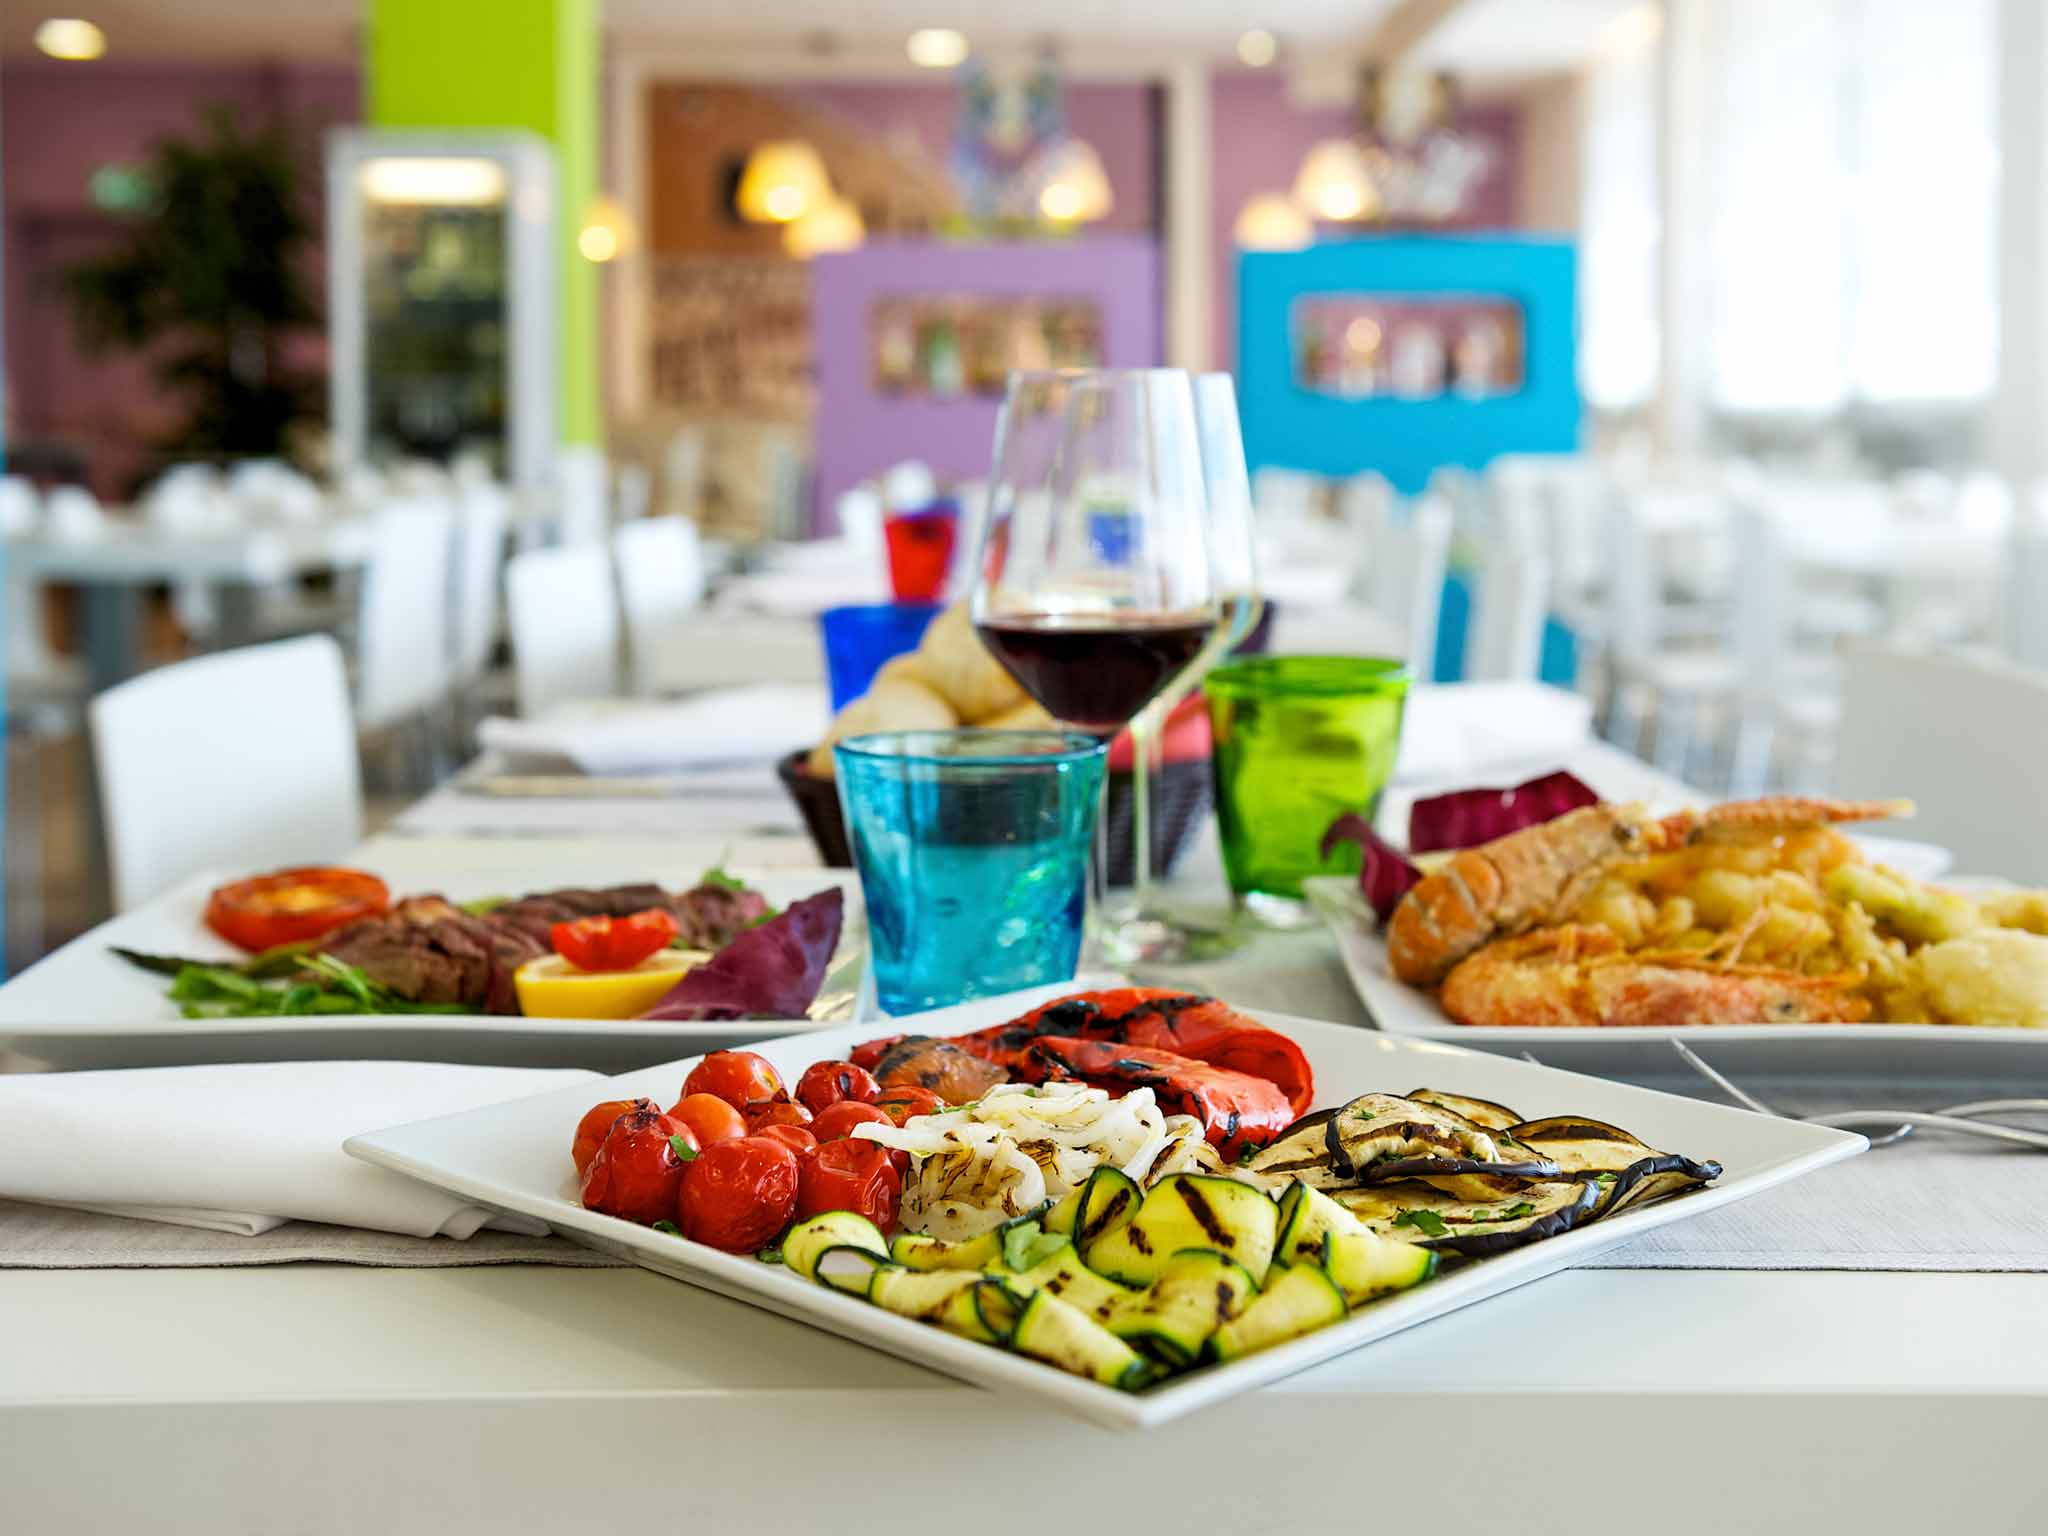 Mercure Venezia Marghera Ресторанно-буфетное обслуживание